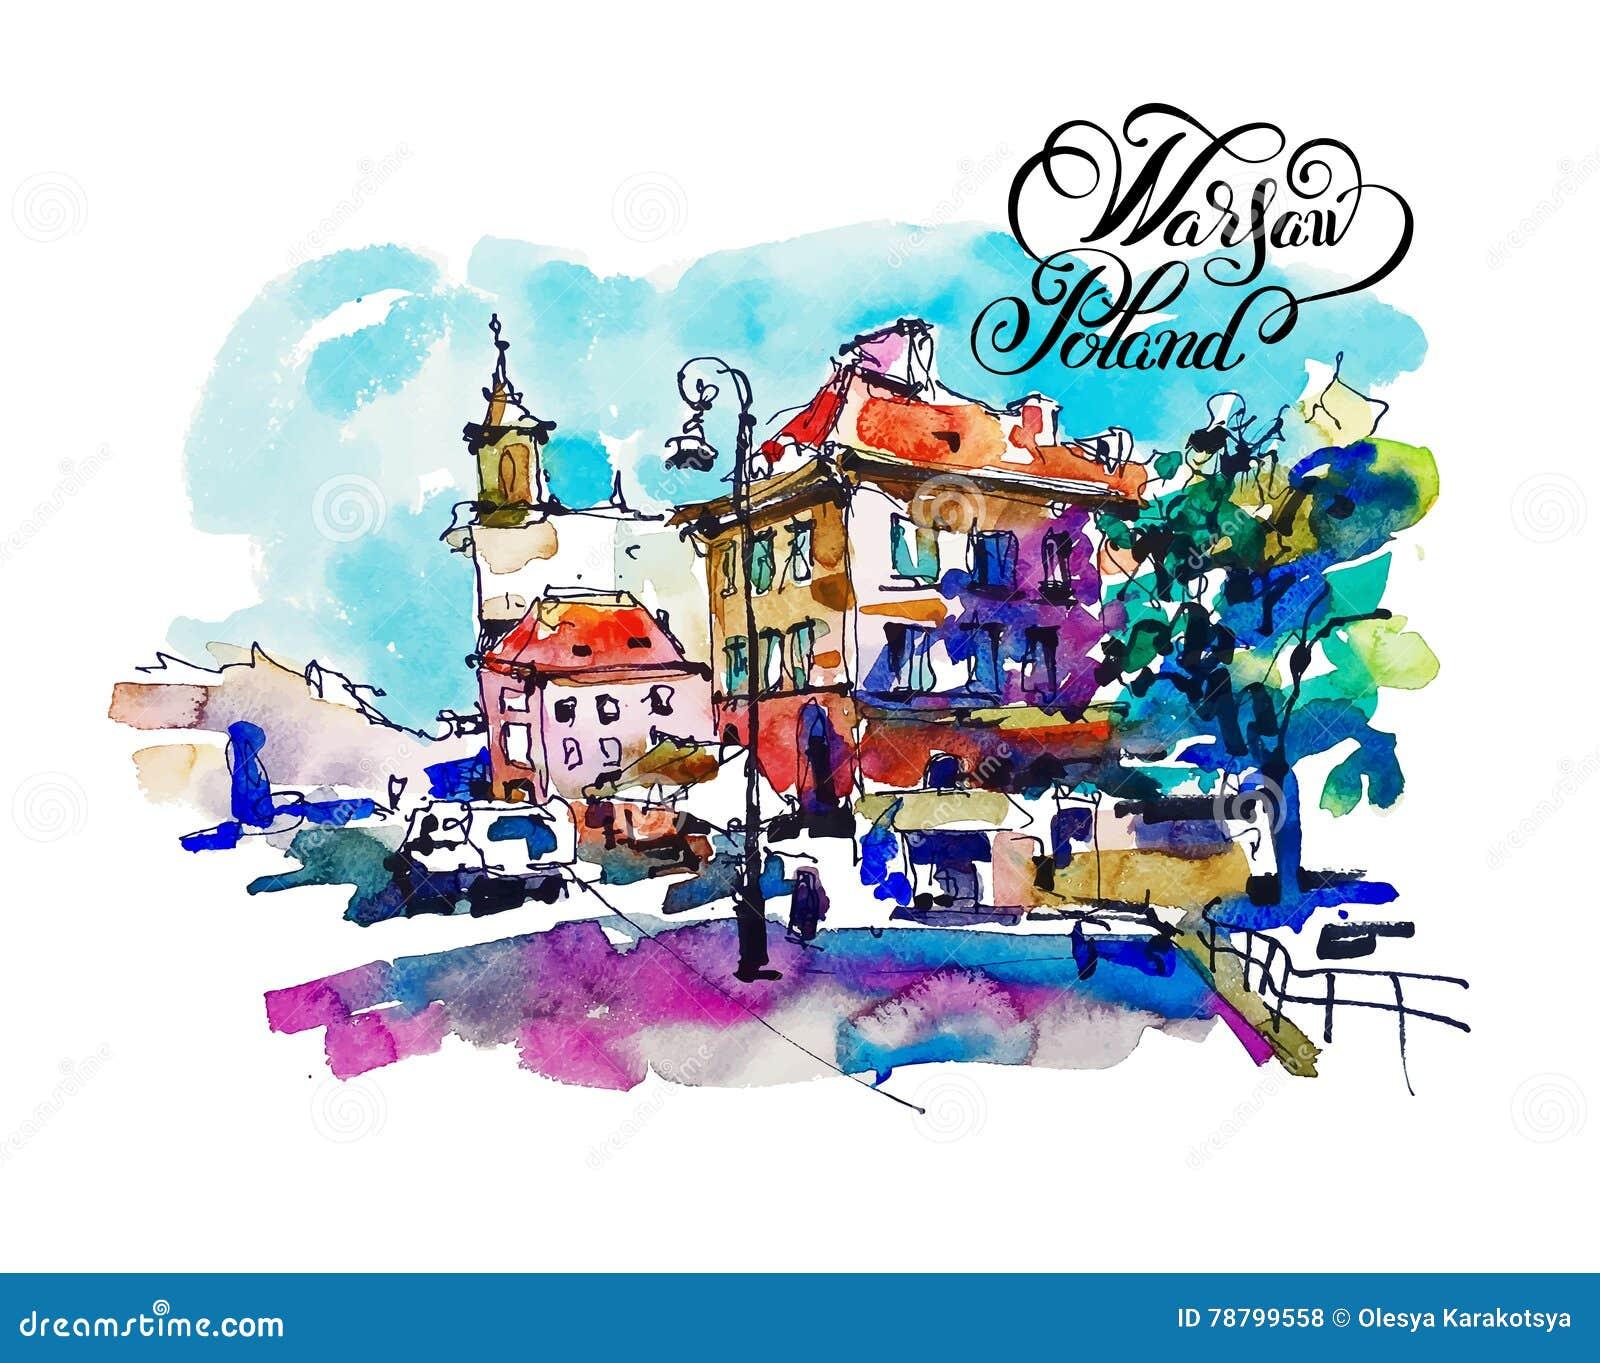 Watercolor sketching old town historical buildings Warsaw